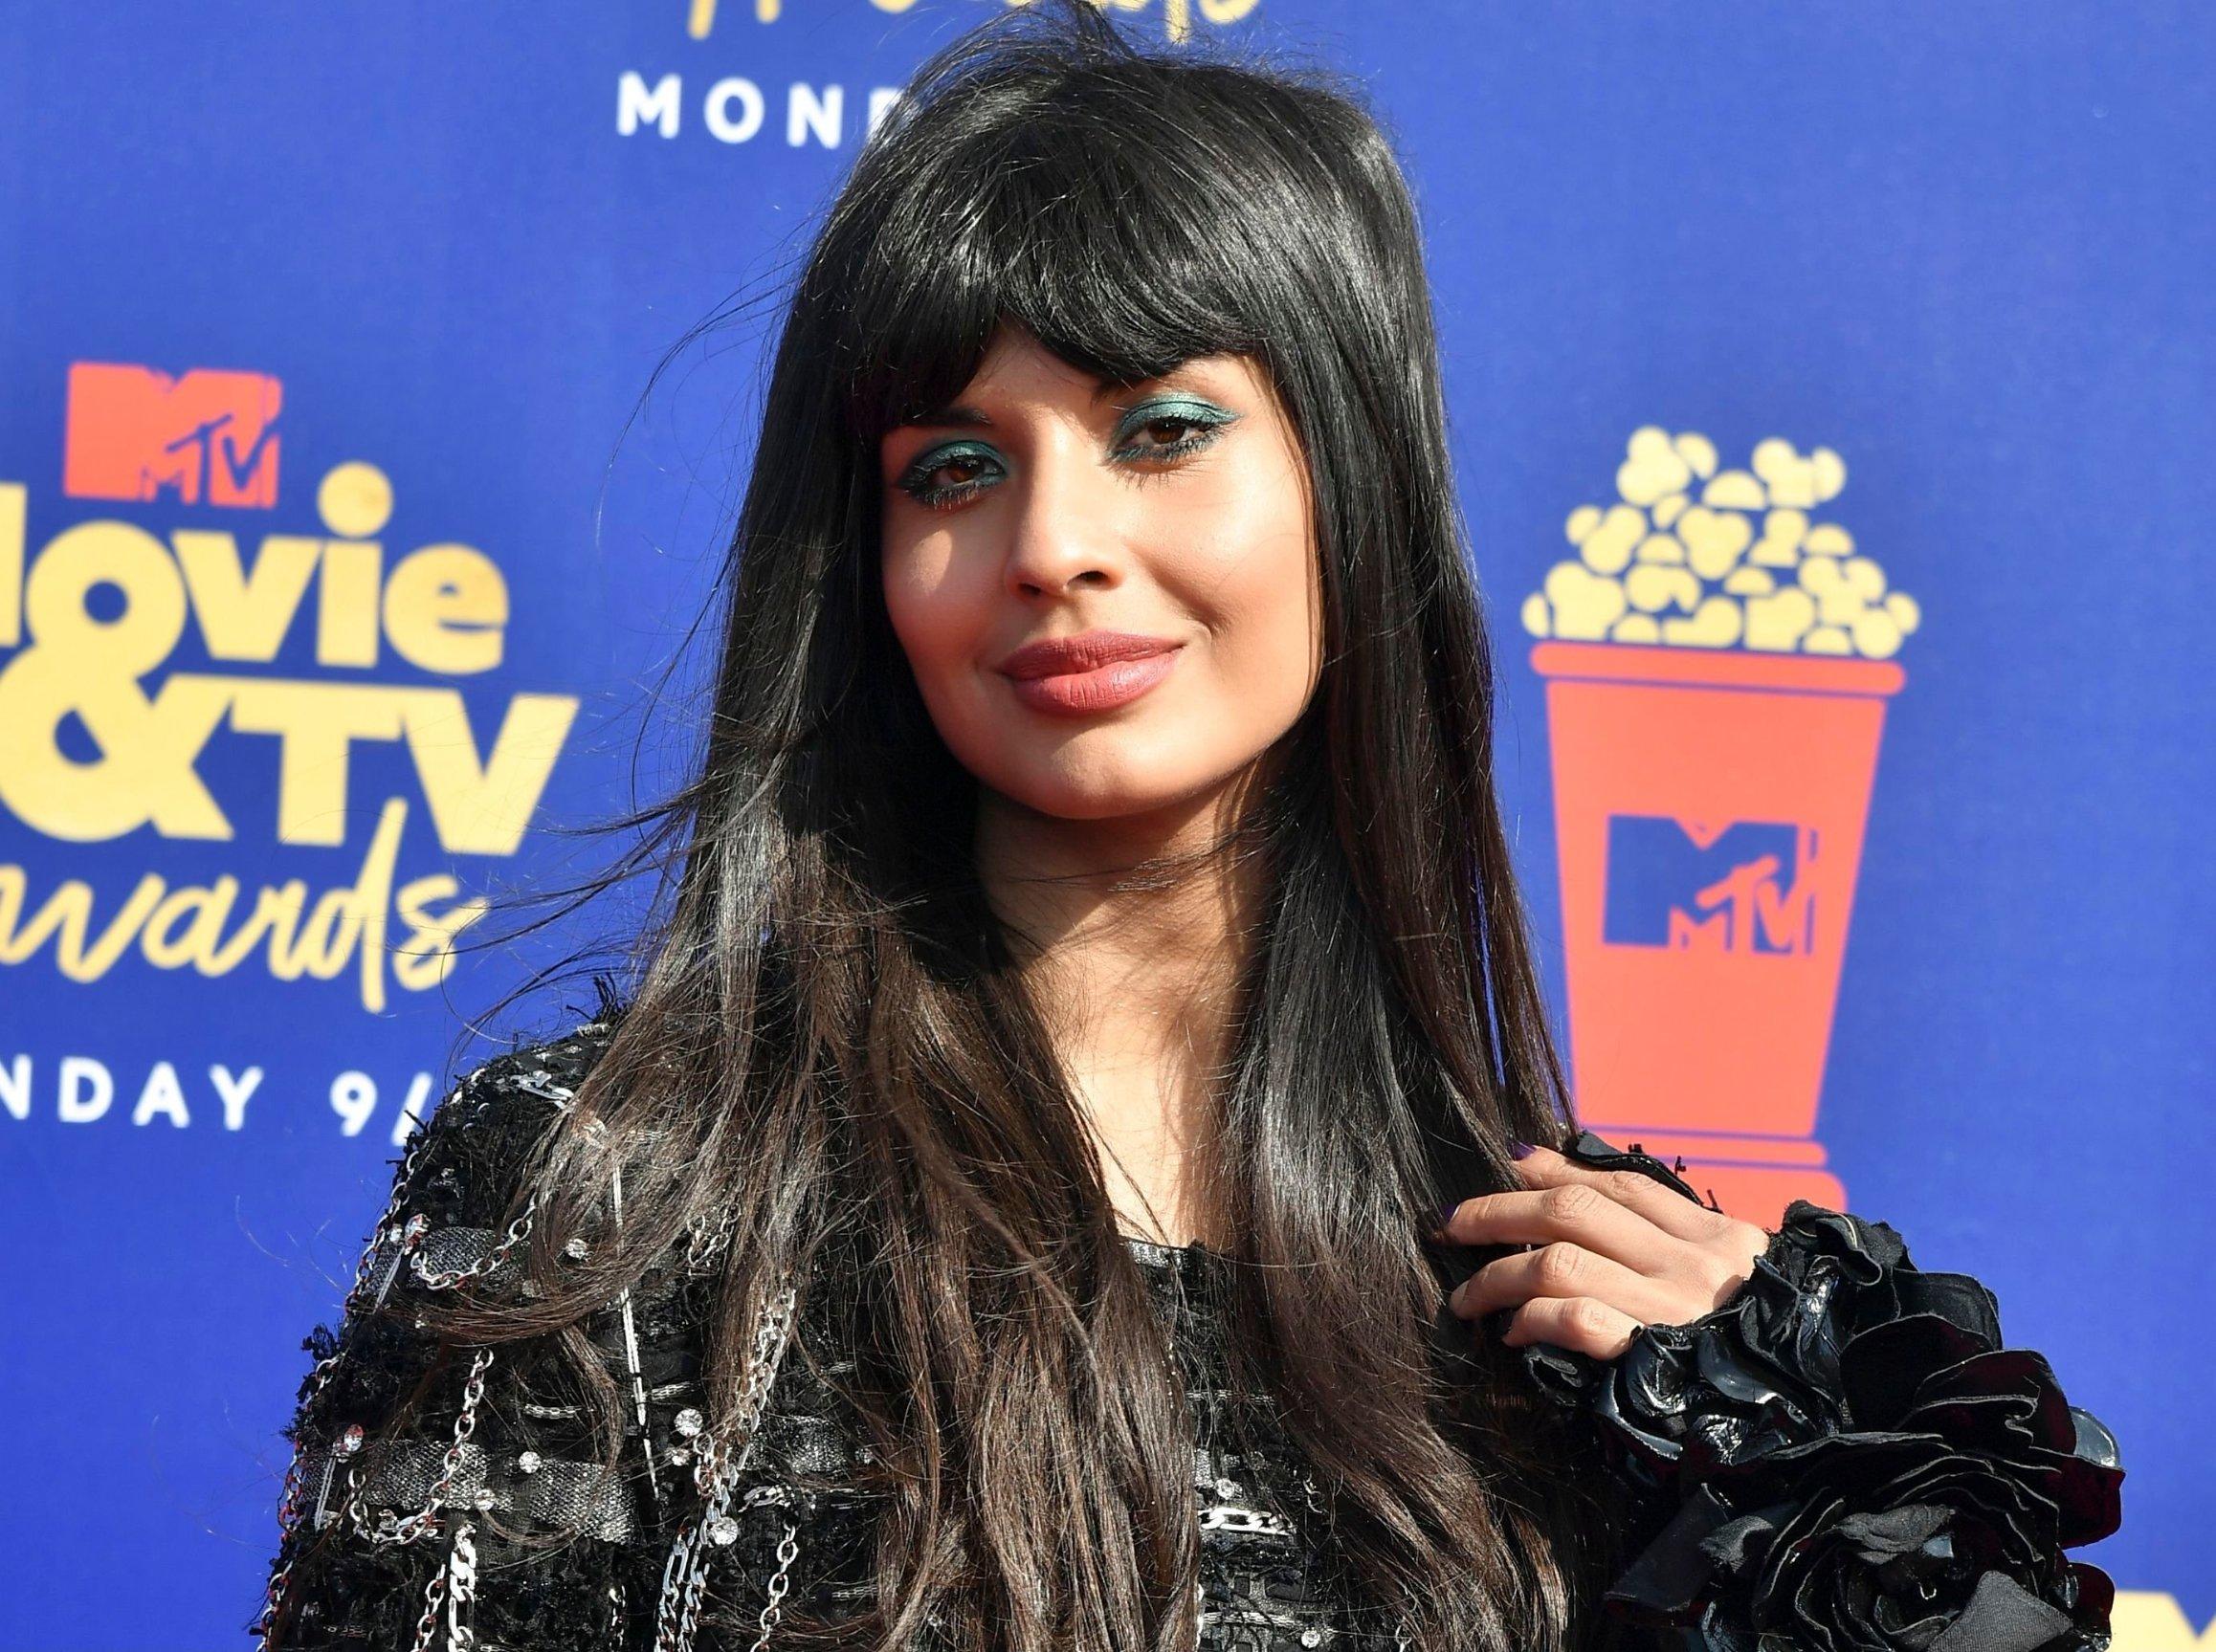 Jameela Jamil MTV Movie & TV Awards, Arrivals, Barker Hangar, Los Angeles, USA - 15 Jun 2019, Image: 448071361, License: Rights-managed, Restrictions: , Model Release: no, Credit line: Profimedia, Shutterstock Editorial